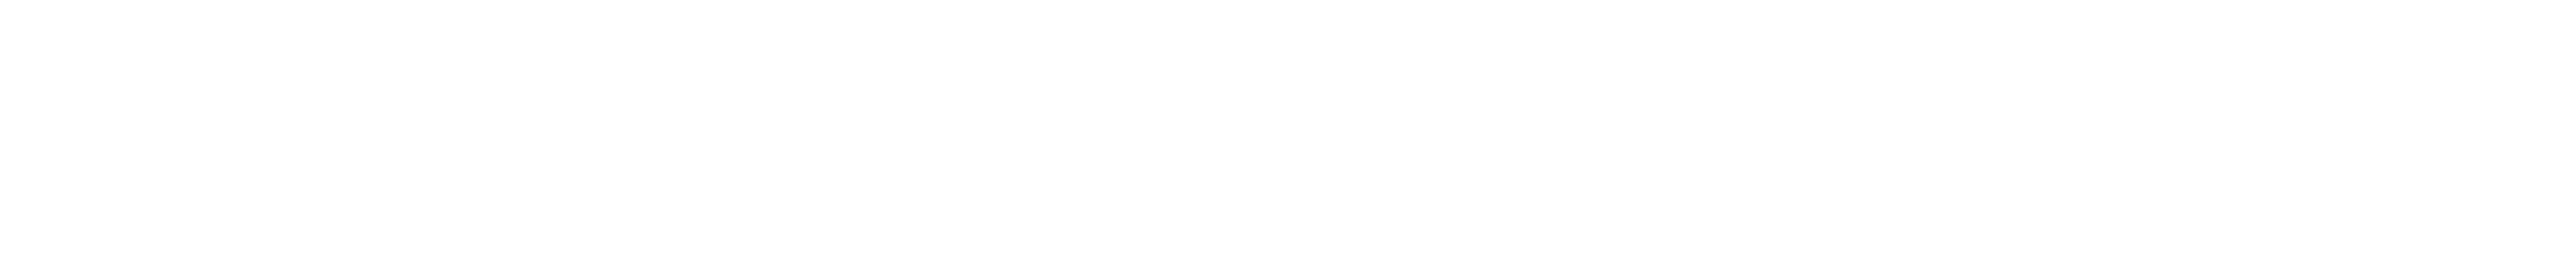 white block bottom